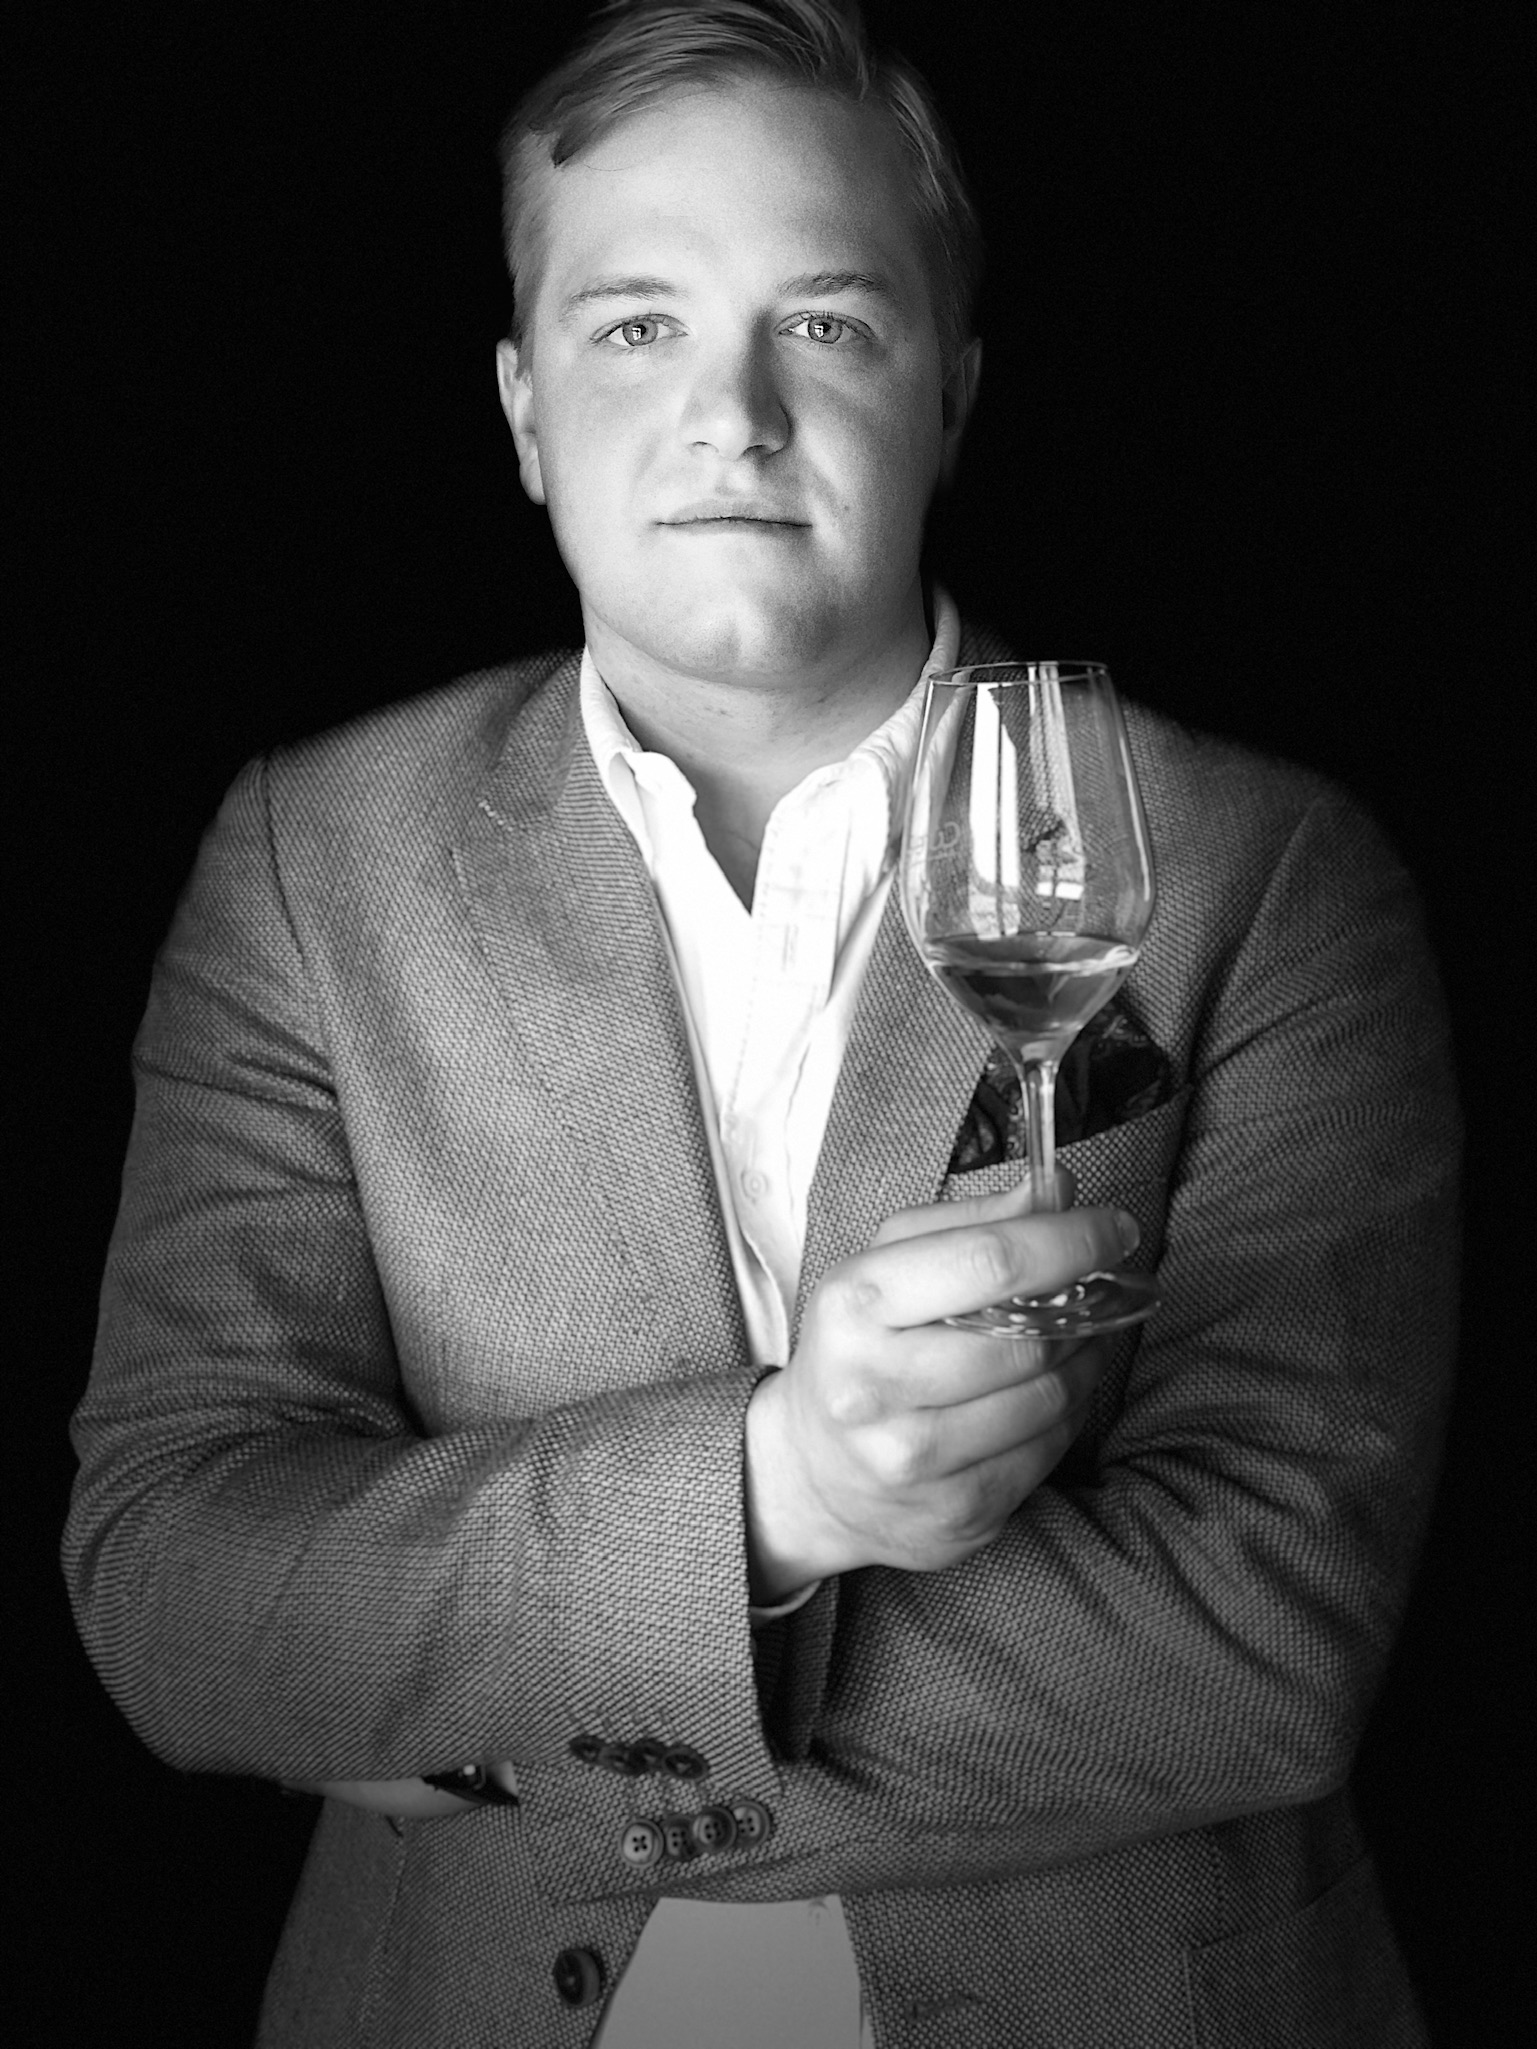 Adam - The Wine Taster